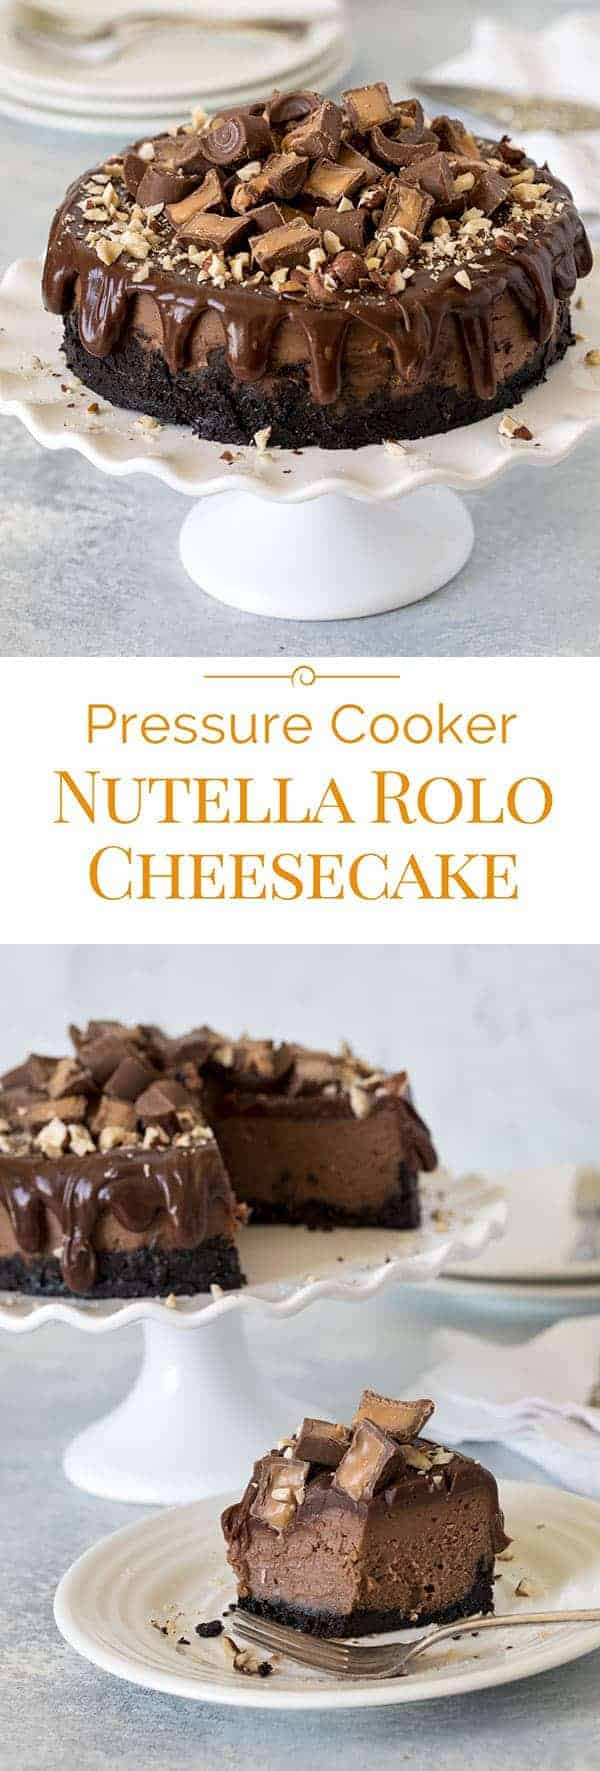 Nutella-Rolo-Cheesecake-Collage